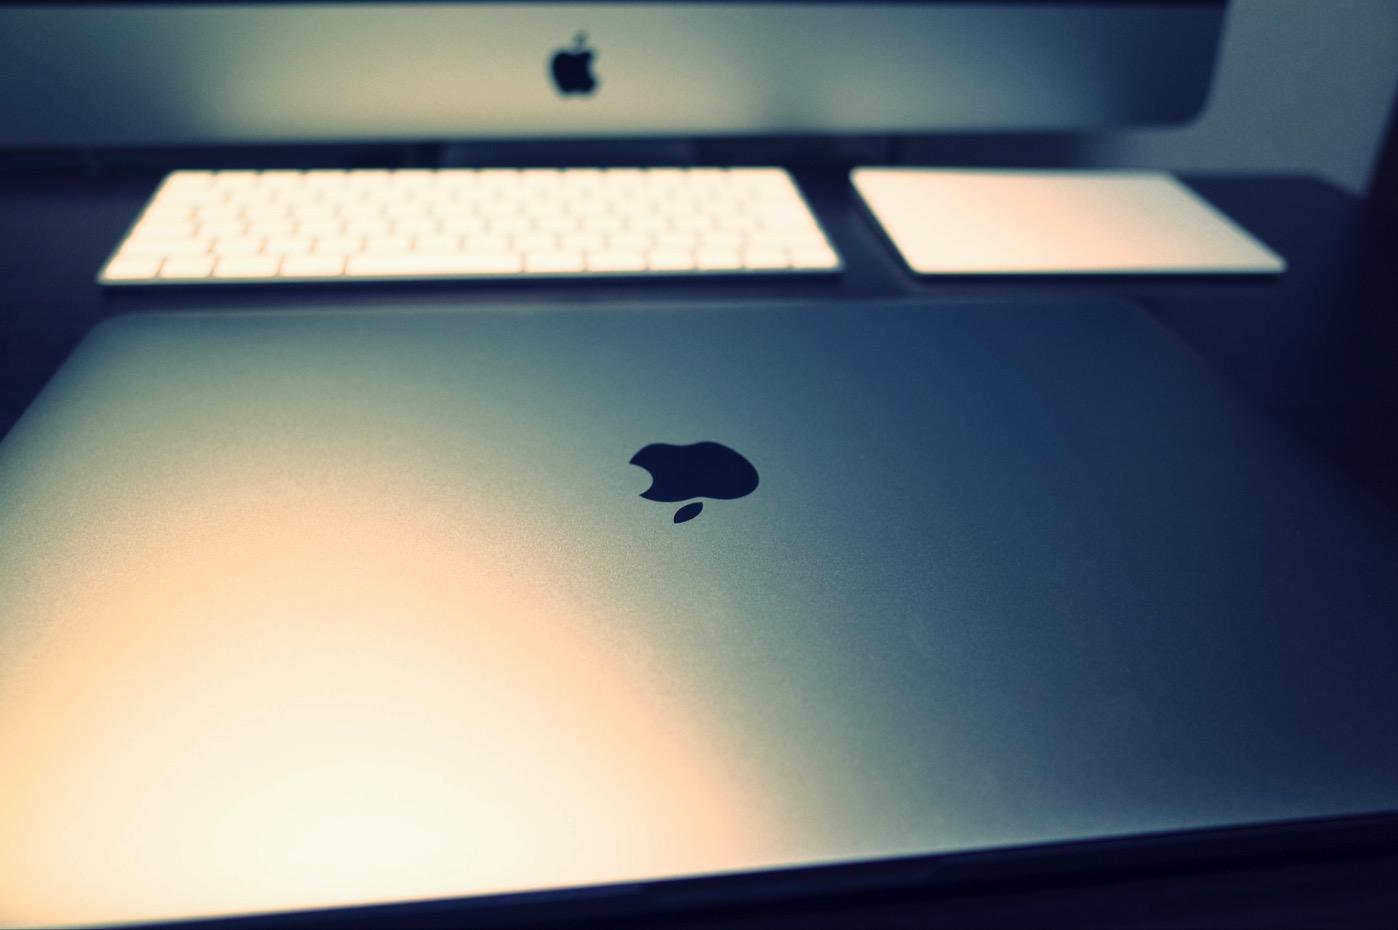 [Mac]これは便利!感圧タッチトラックパッドで「3 本指のドラッグ」を有効にする方法